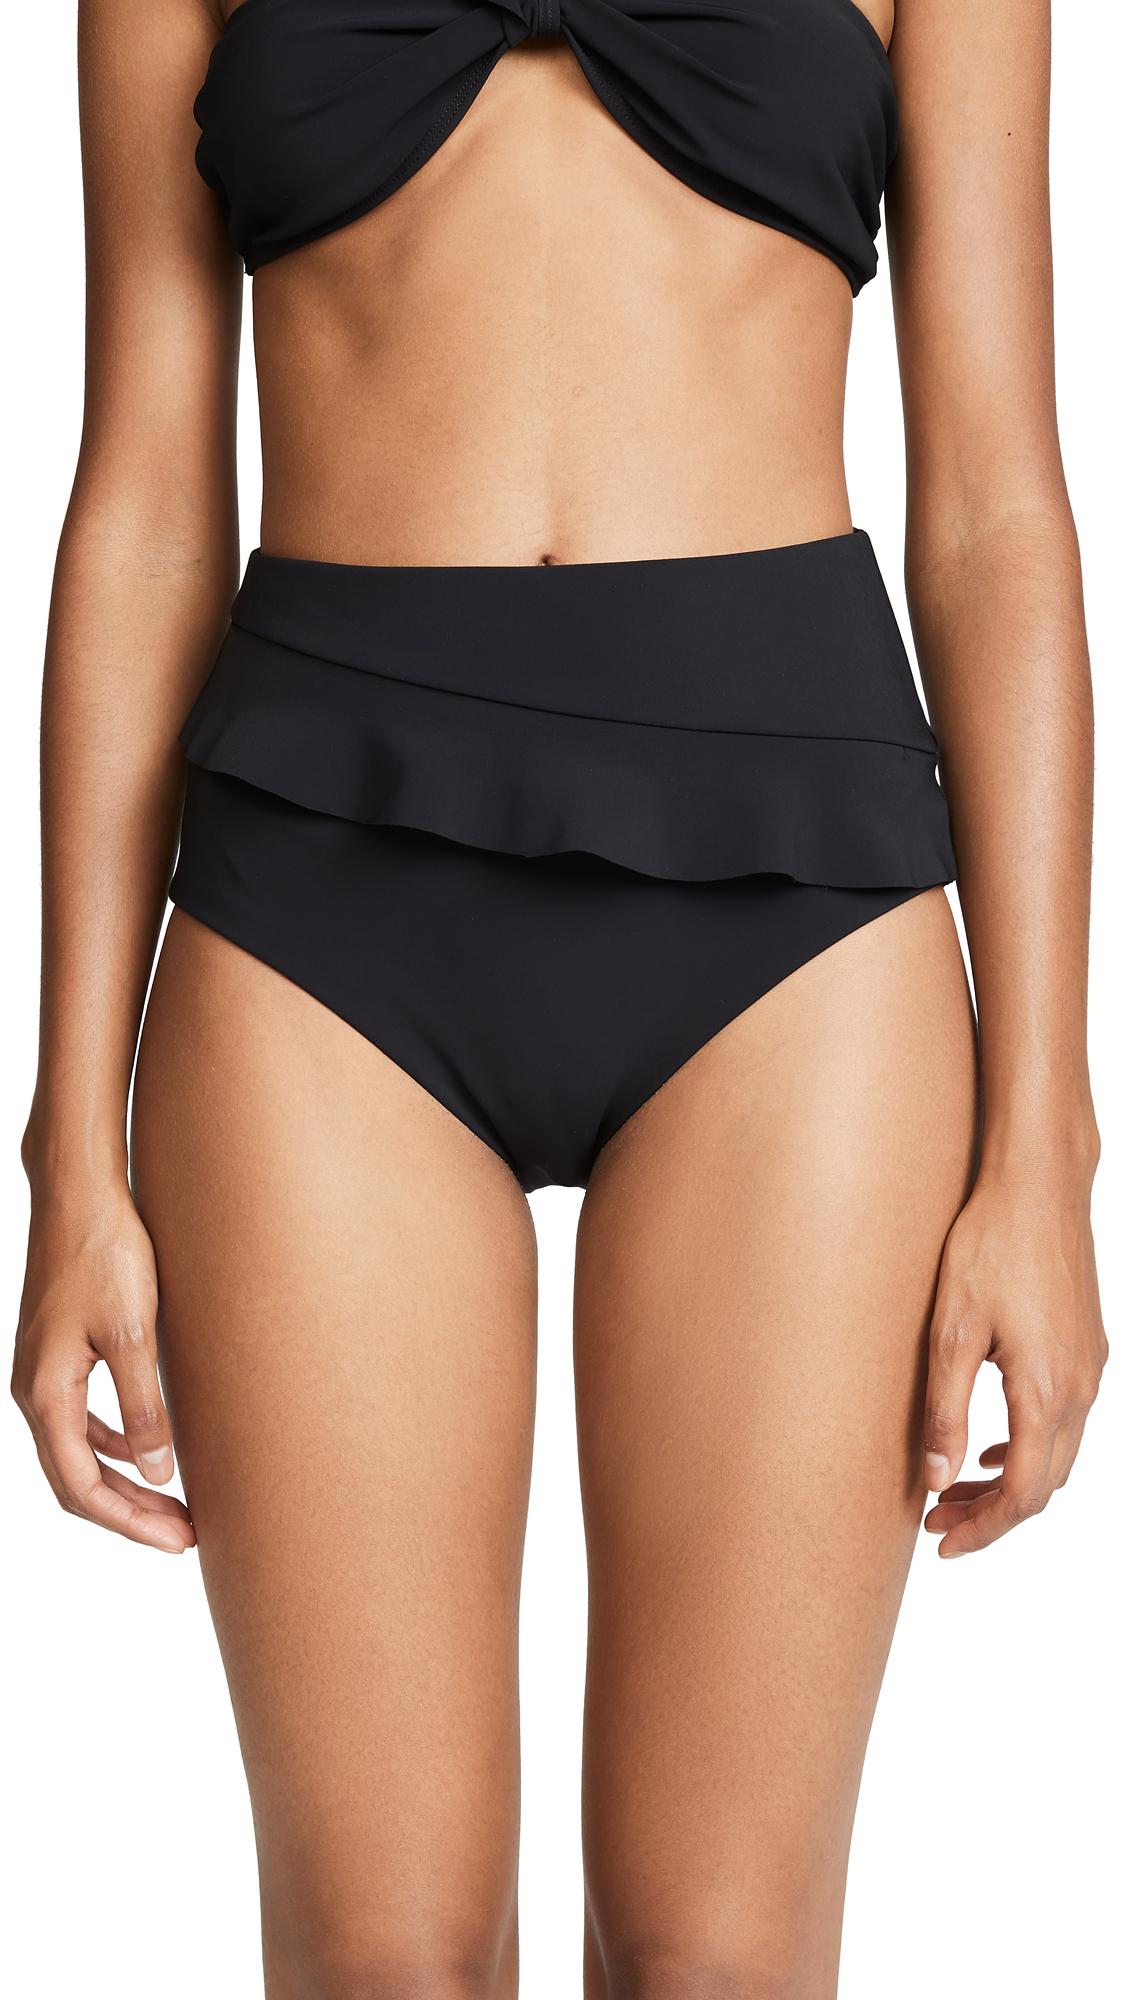 Ruffle trim High-waisted bikini bottoms Lined Shell: 85% polyamide/15% elastane Hand wash Made in the USA